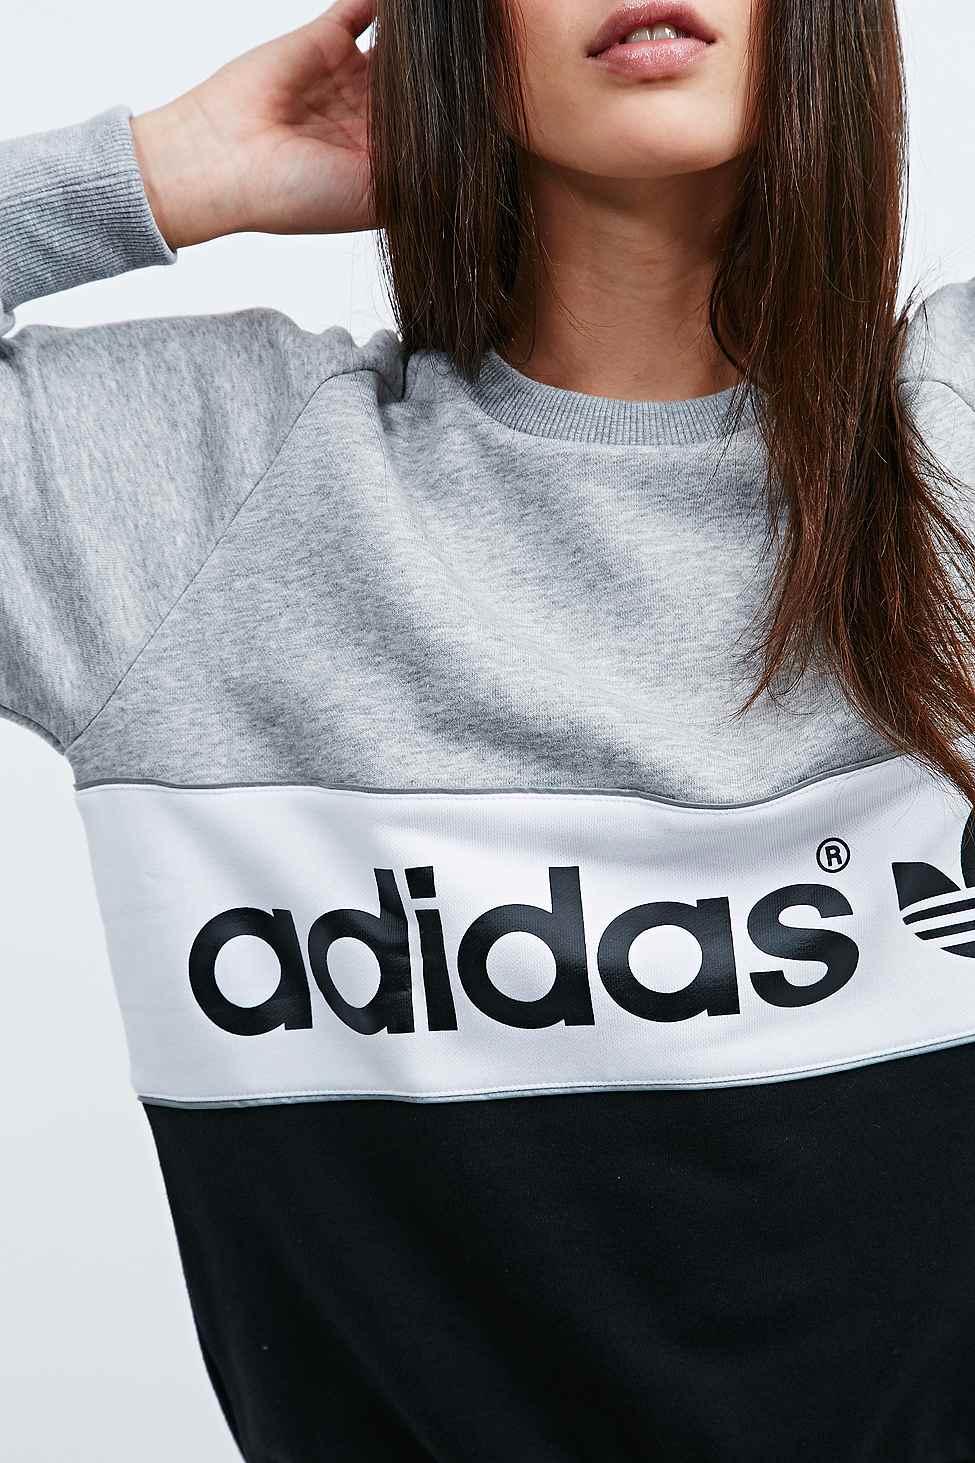 adidas City Sweatshirt In Grey And Black in Gray - Lyst e8fb32f89d